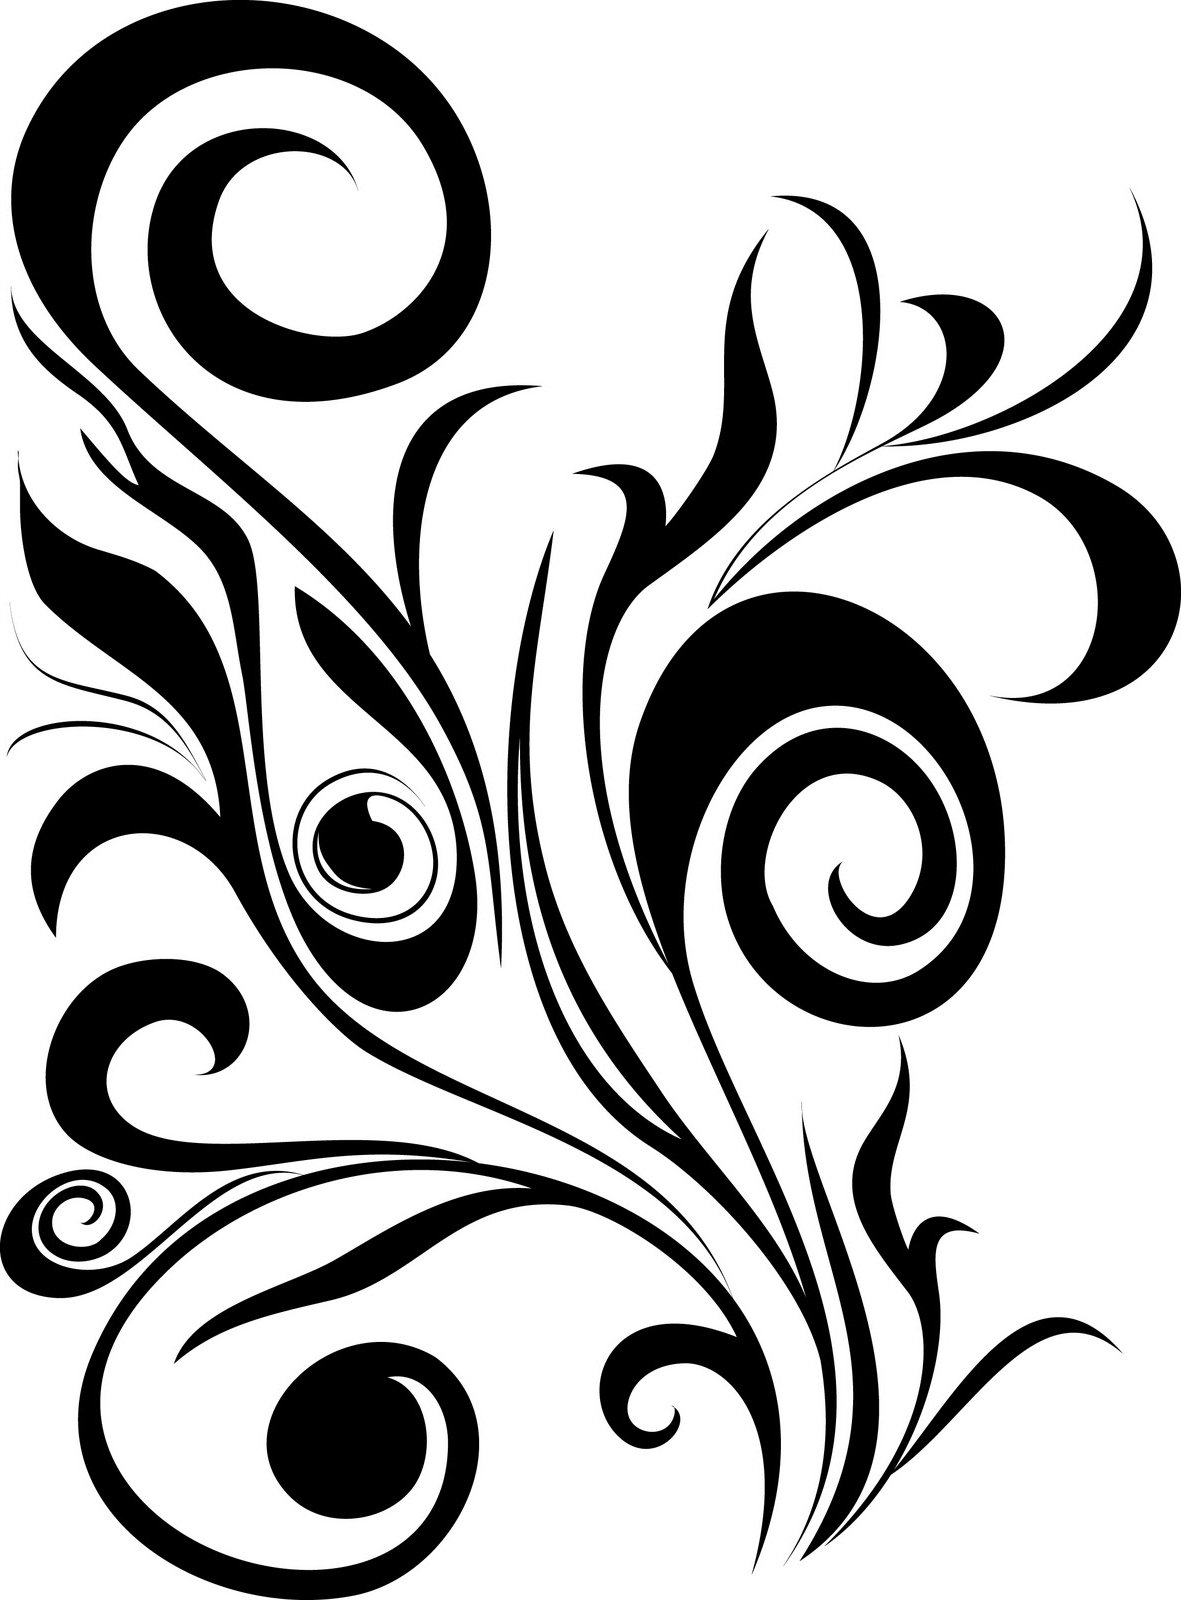 simple swirl vector - HD1181×1600